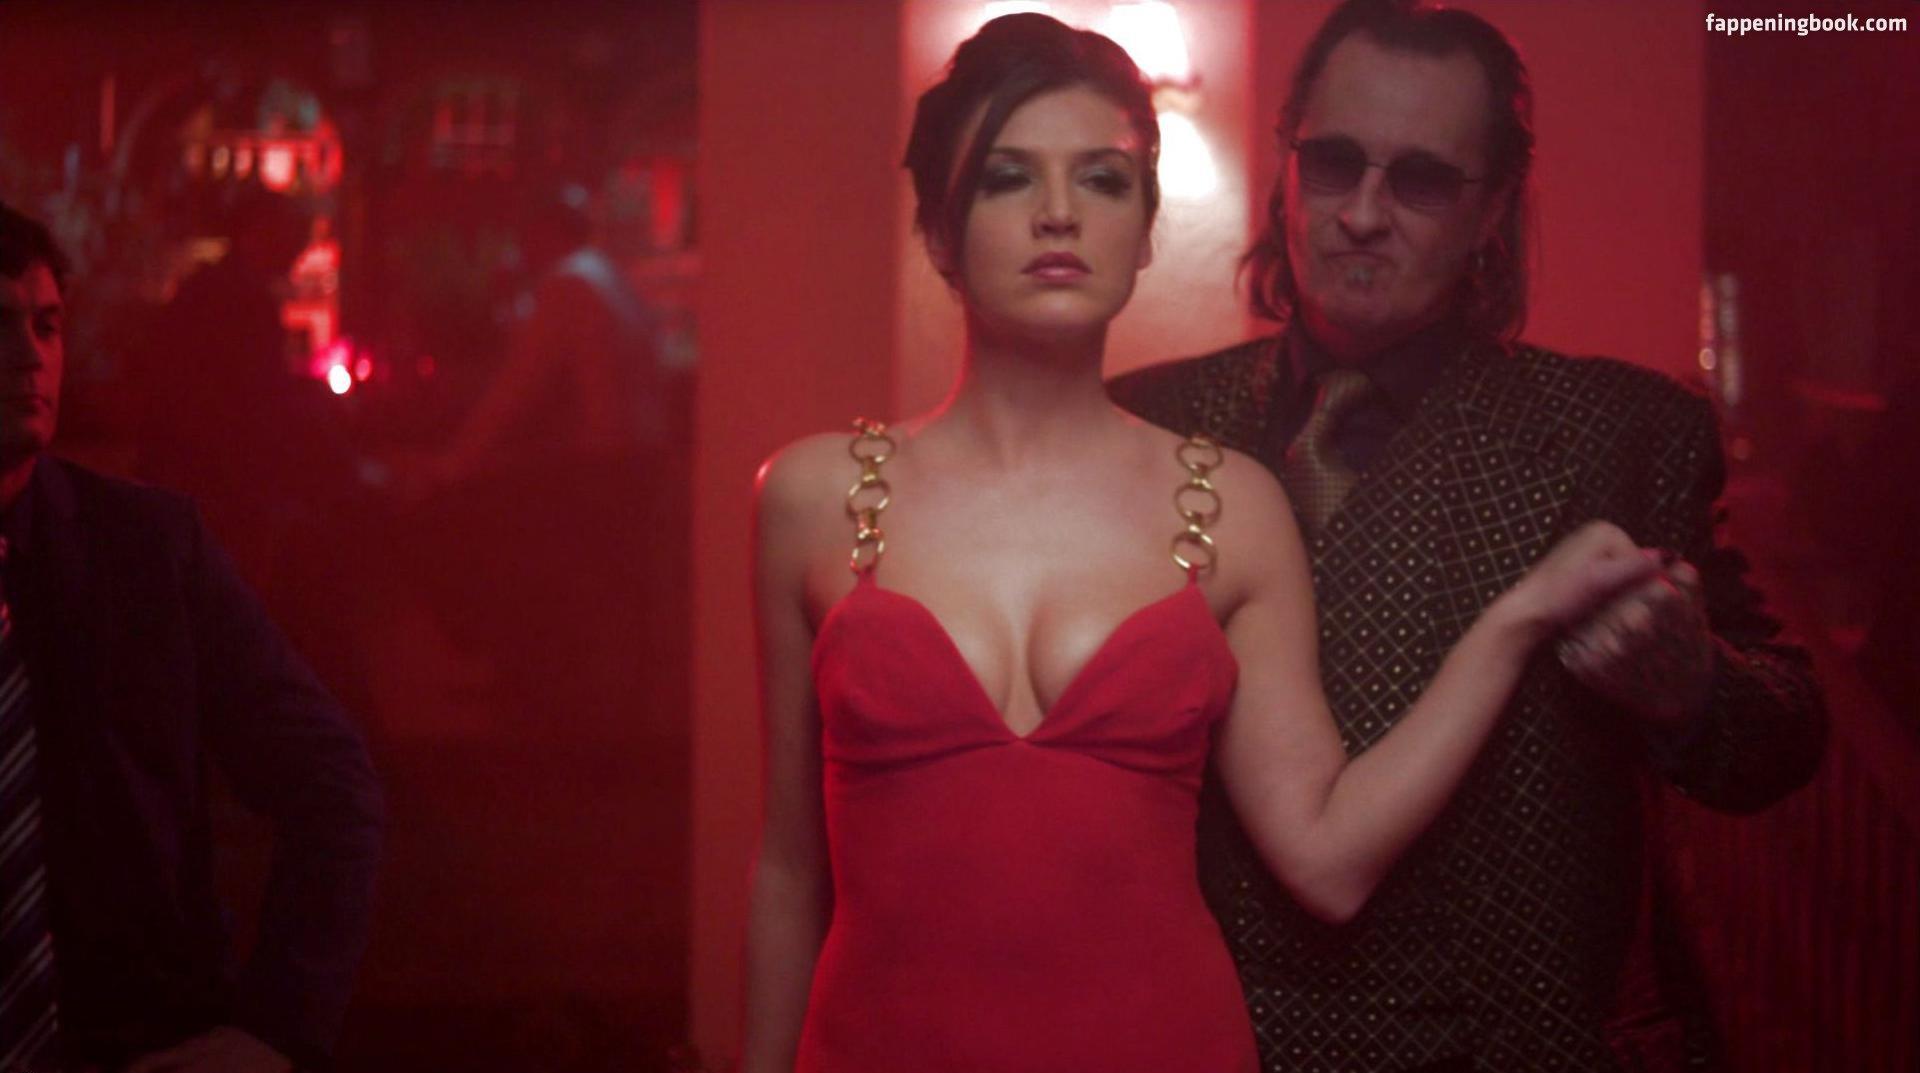 Barbara Nedeljakova Nude, Sexy, The Fappening, Uncensored